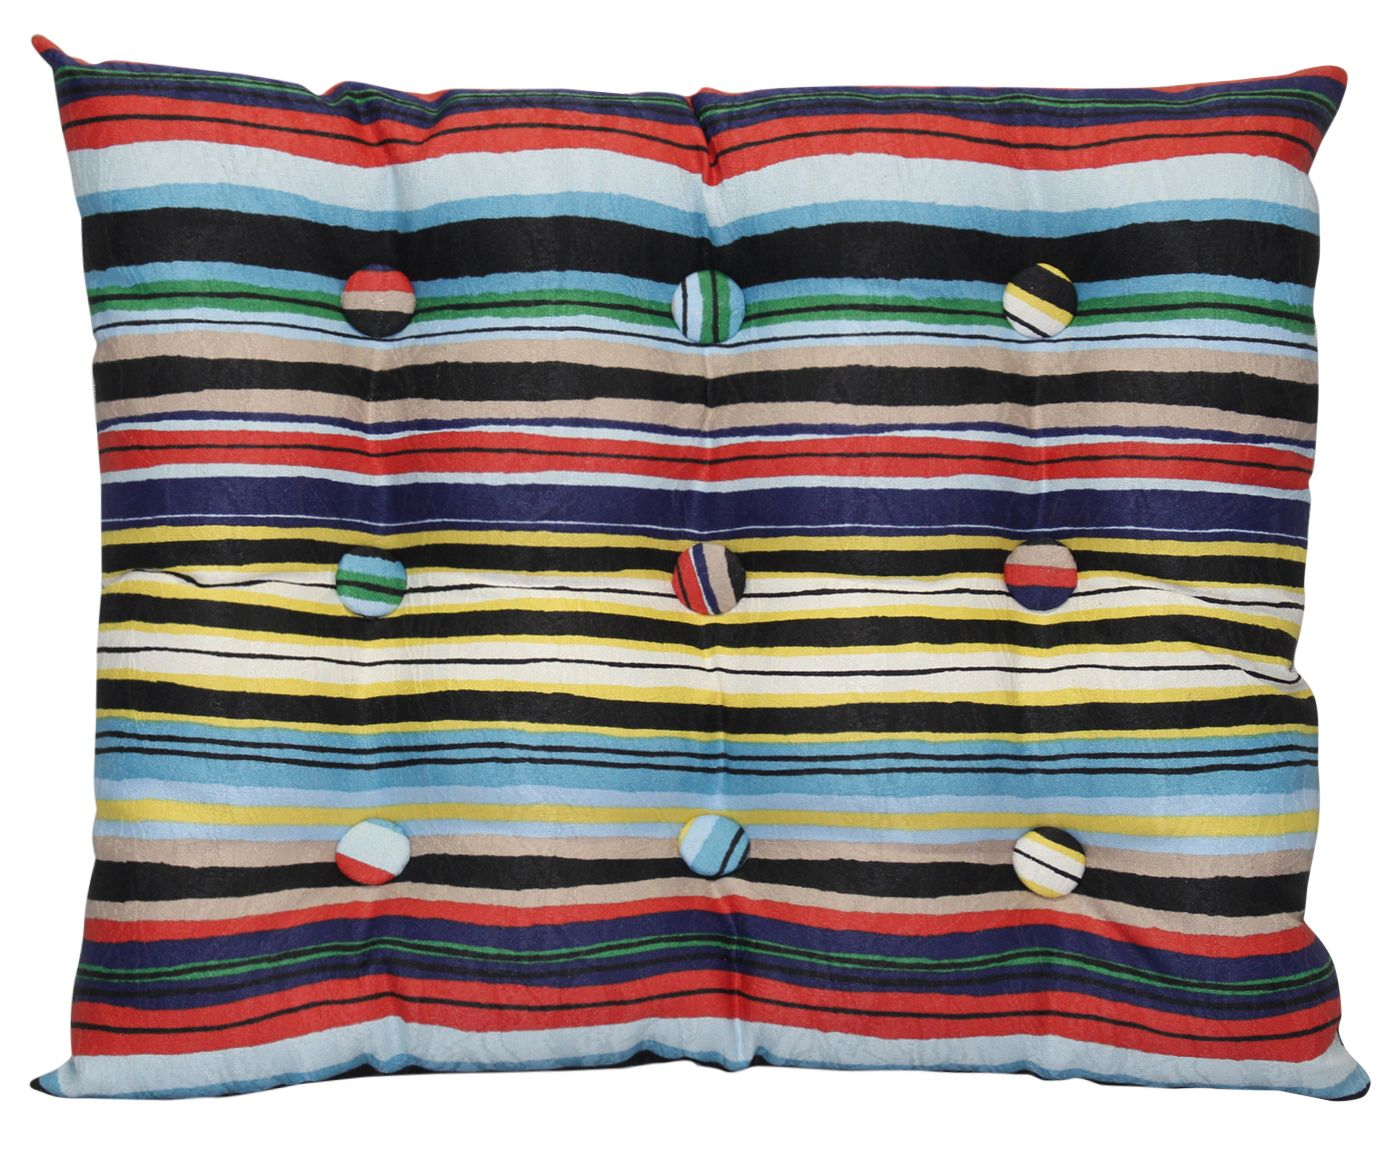 Almofada Zabuton Marble Striped Bandy - 40x50cm   Westwing.com.br